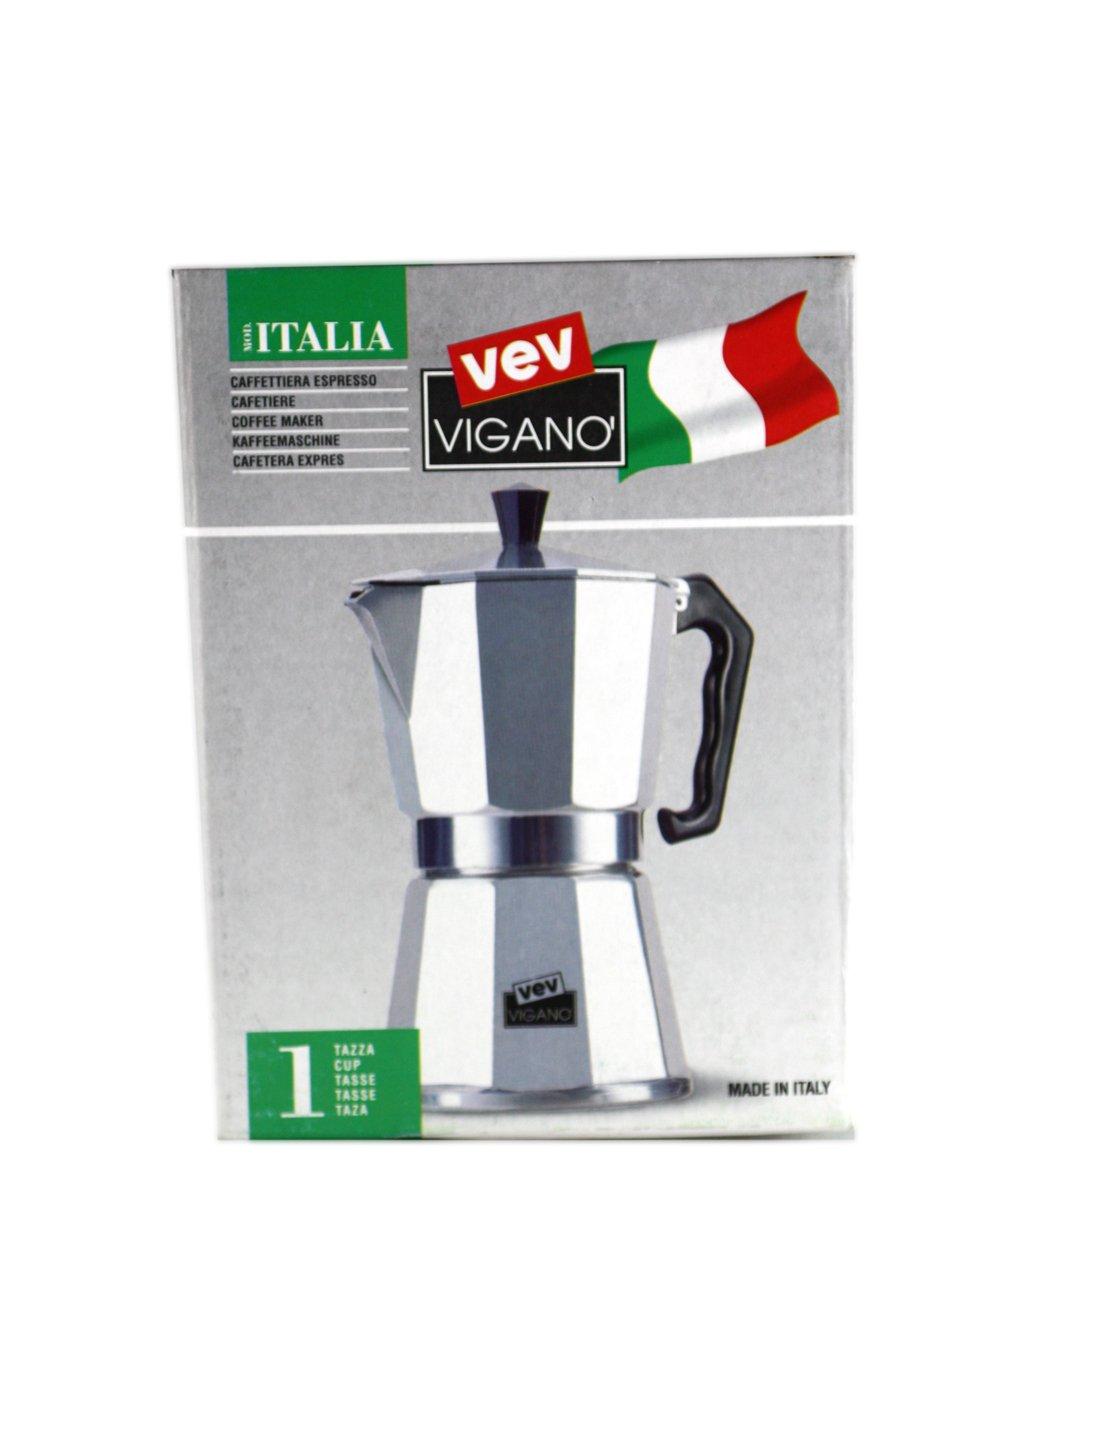 Vev Vigano Italia Herd Espressokocher 1 Tasse / Hergestellt IN Italien!